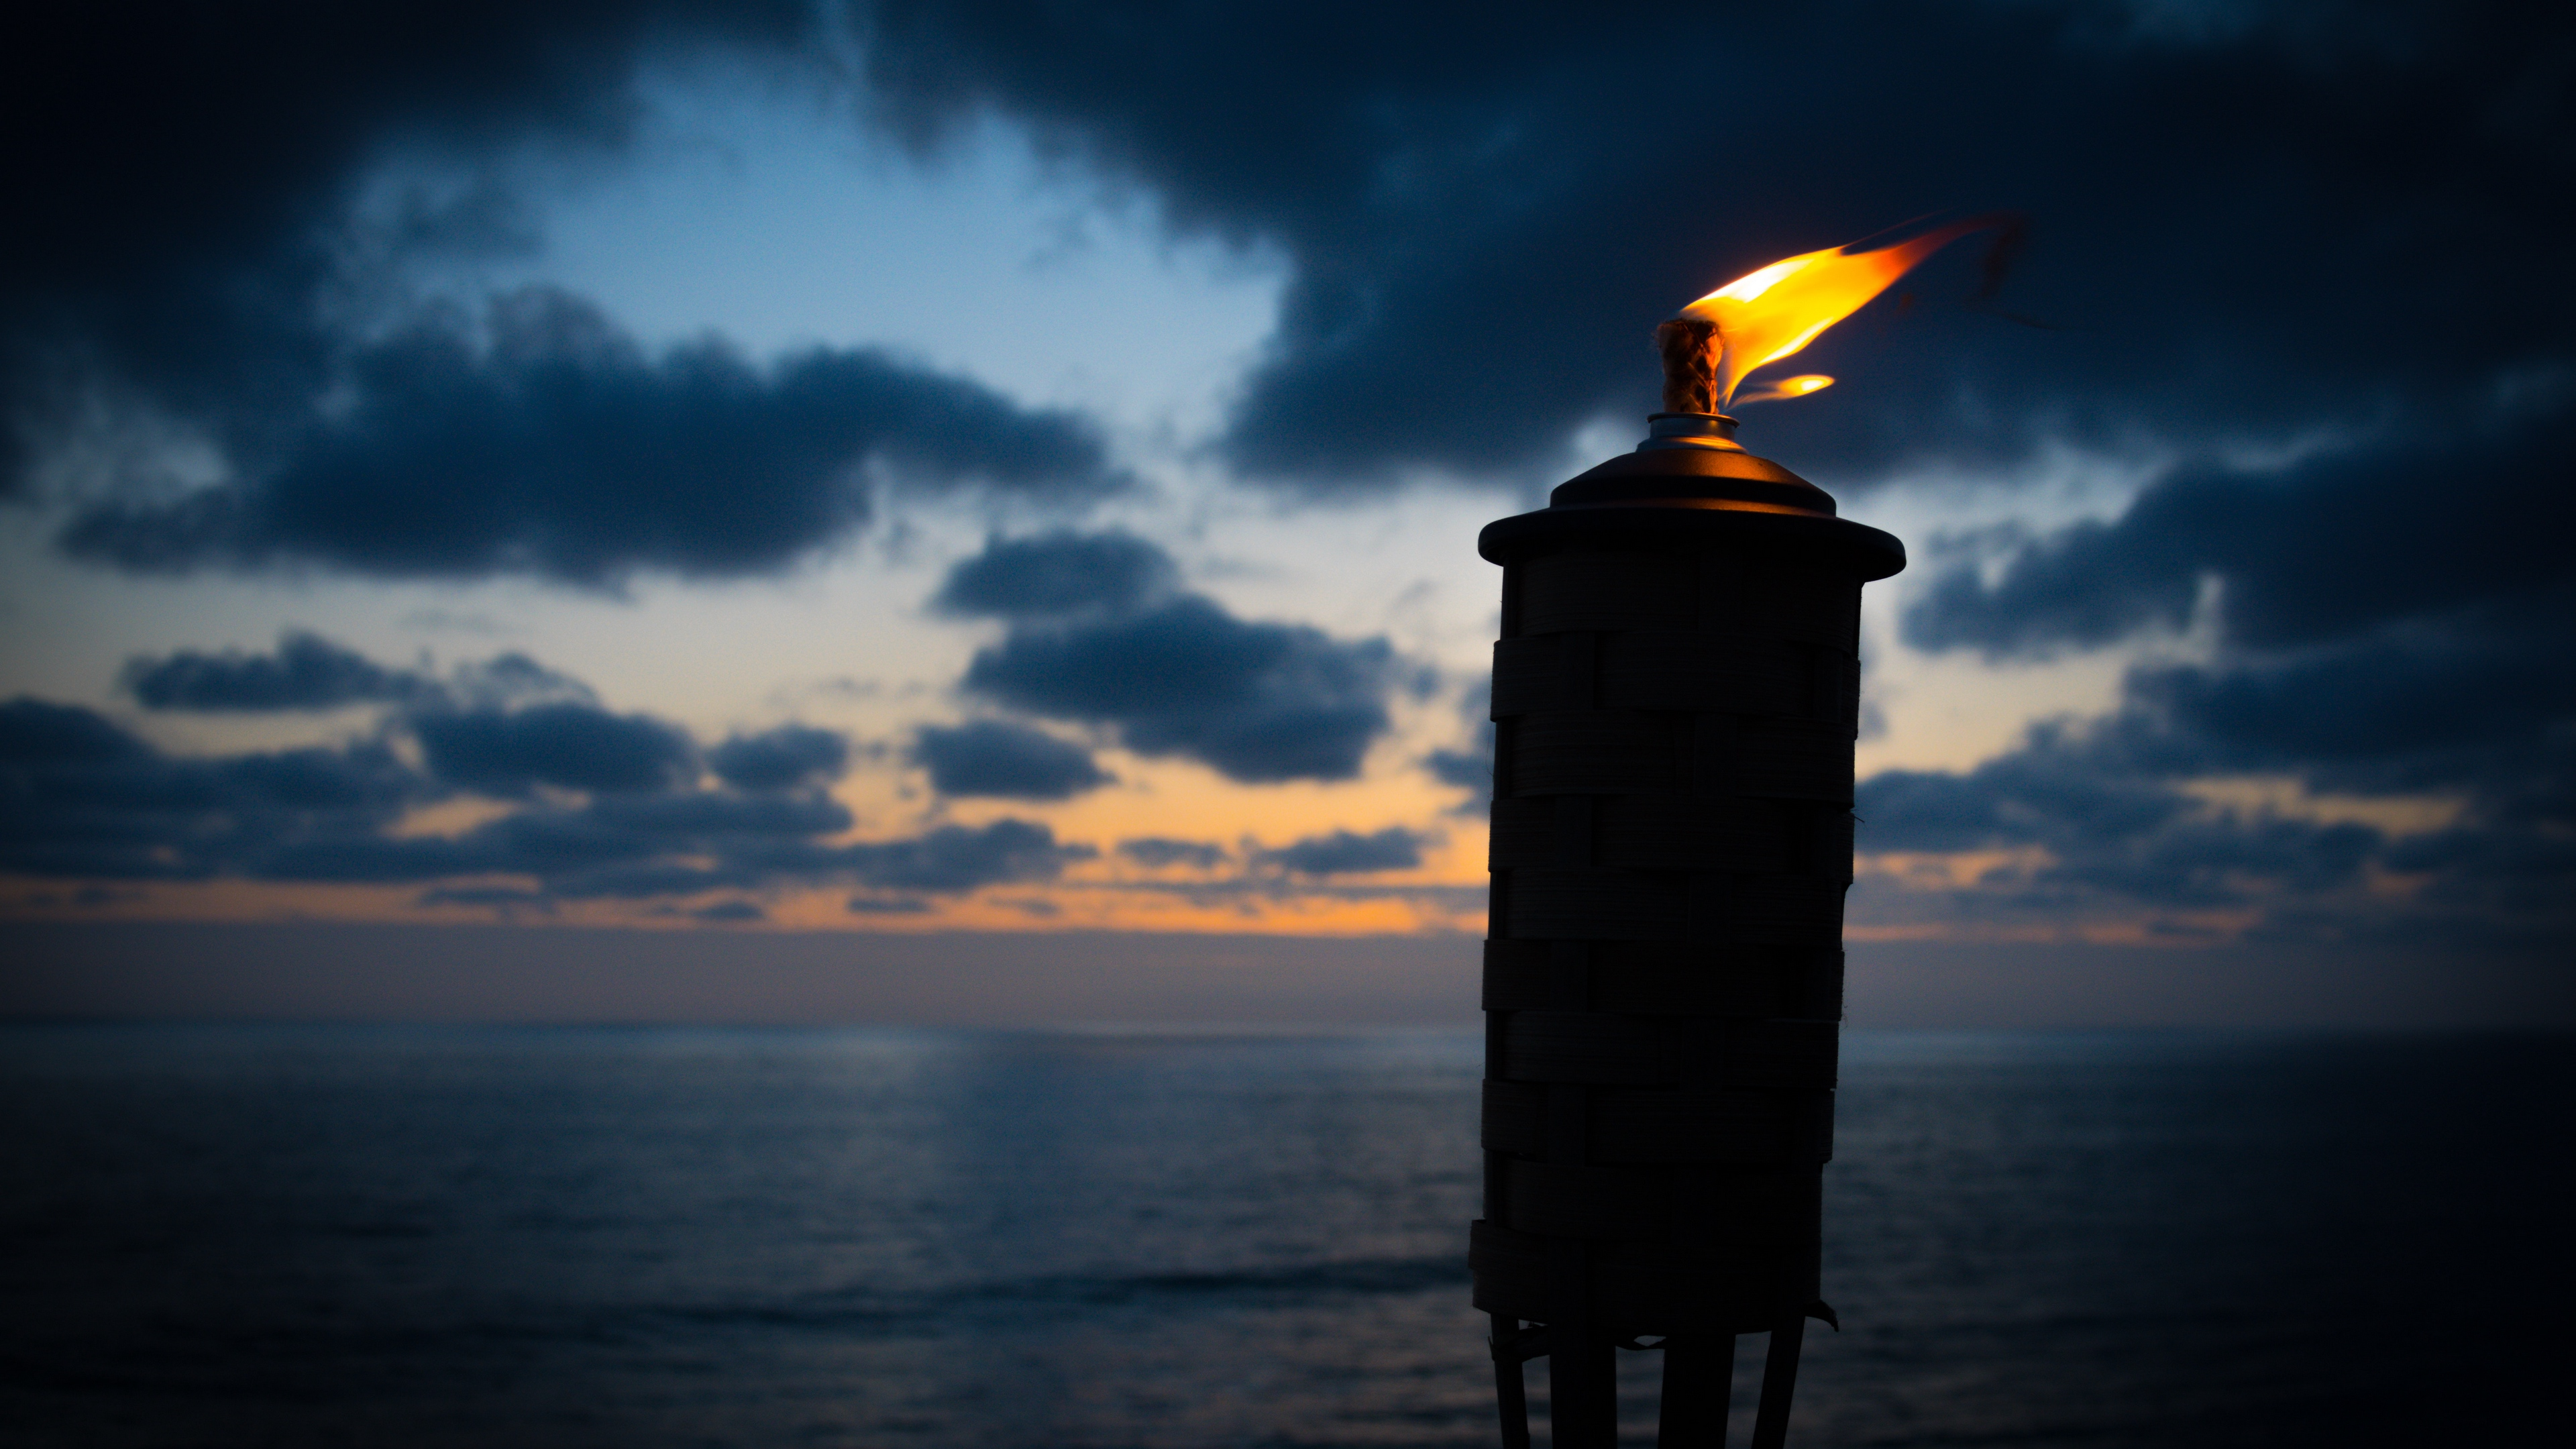 torch fire wick night 4k 1540575057 - torch, fire, wick, night 4k - wick, torch, Fire